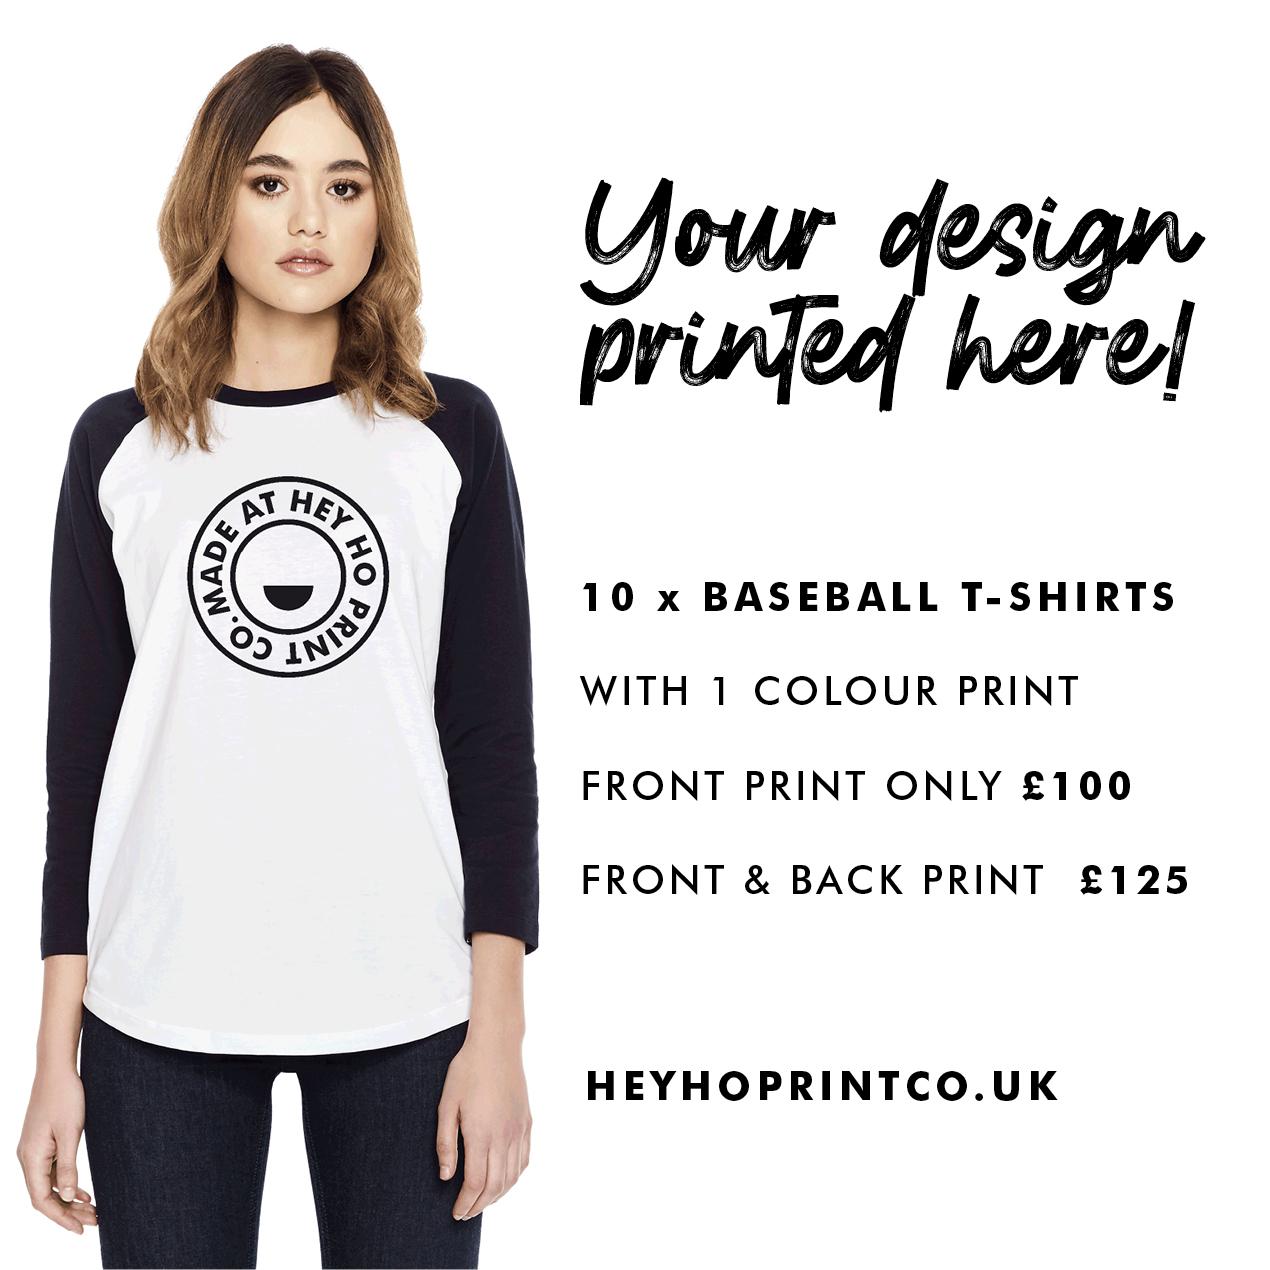 10 x Organic Screen Printed Baseball Tee's Deal